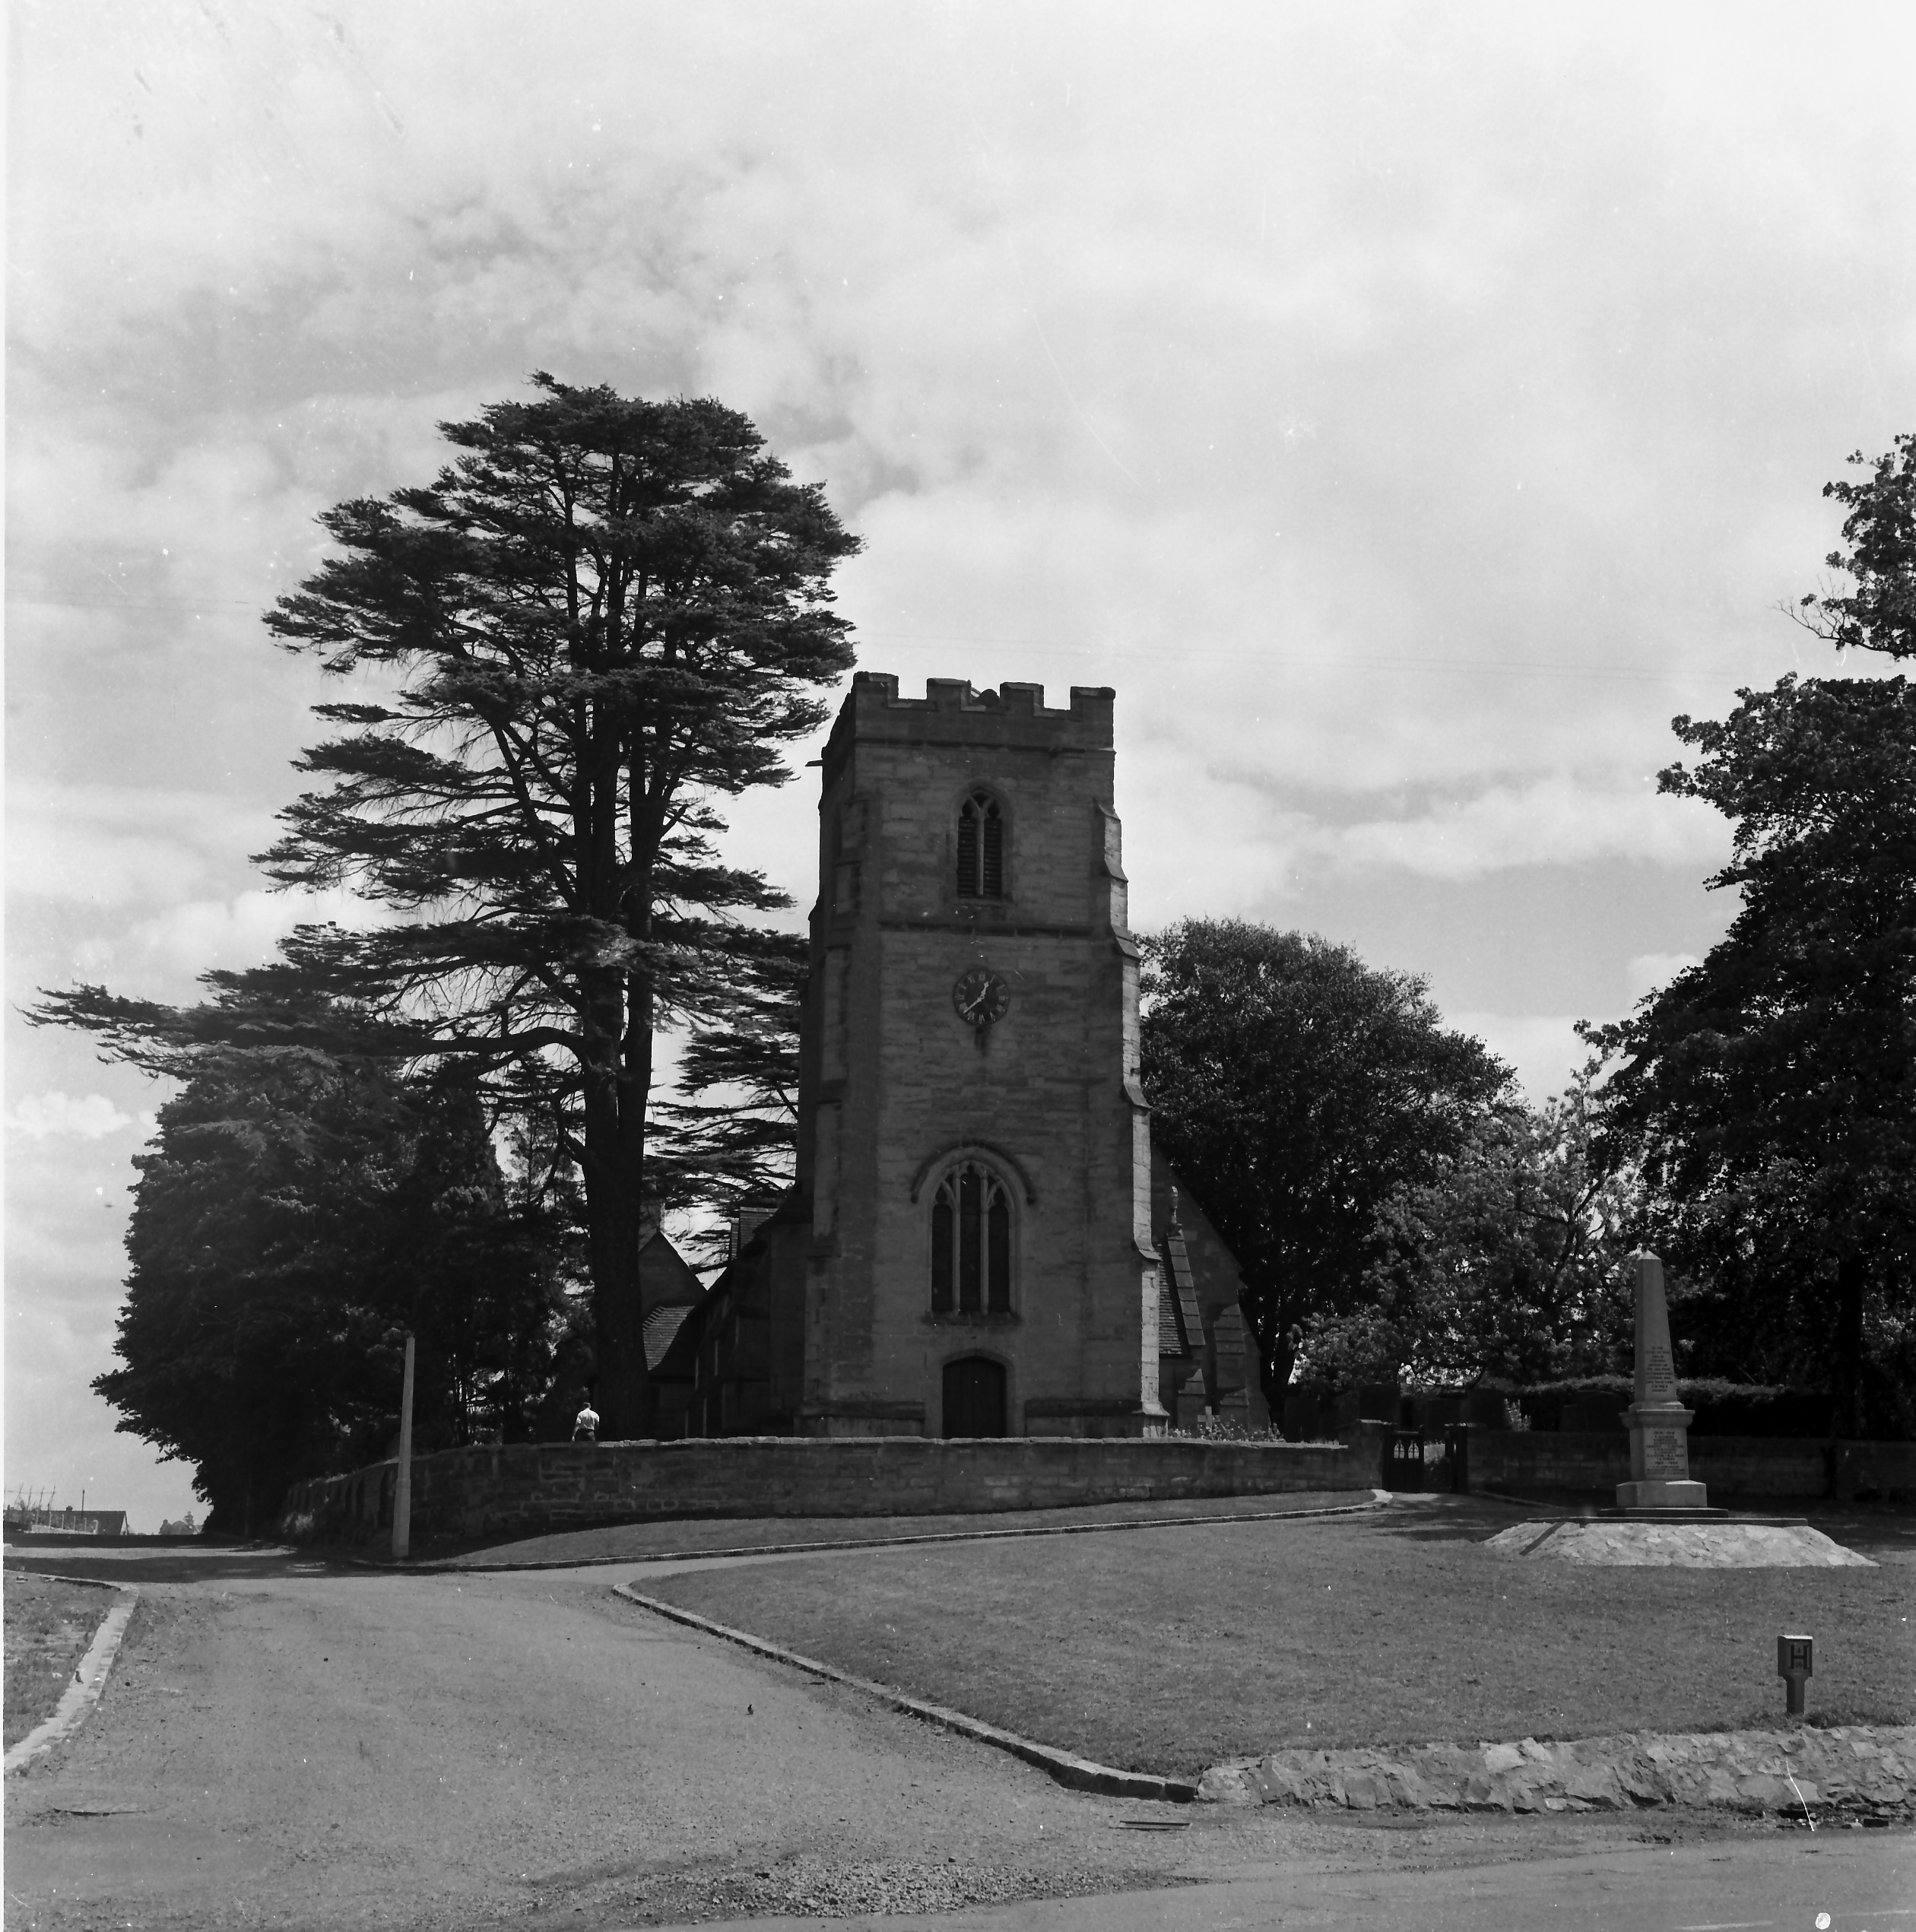 Whitnash-St-Margarets-church